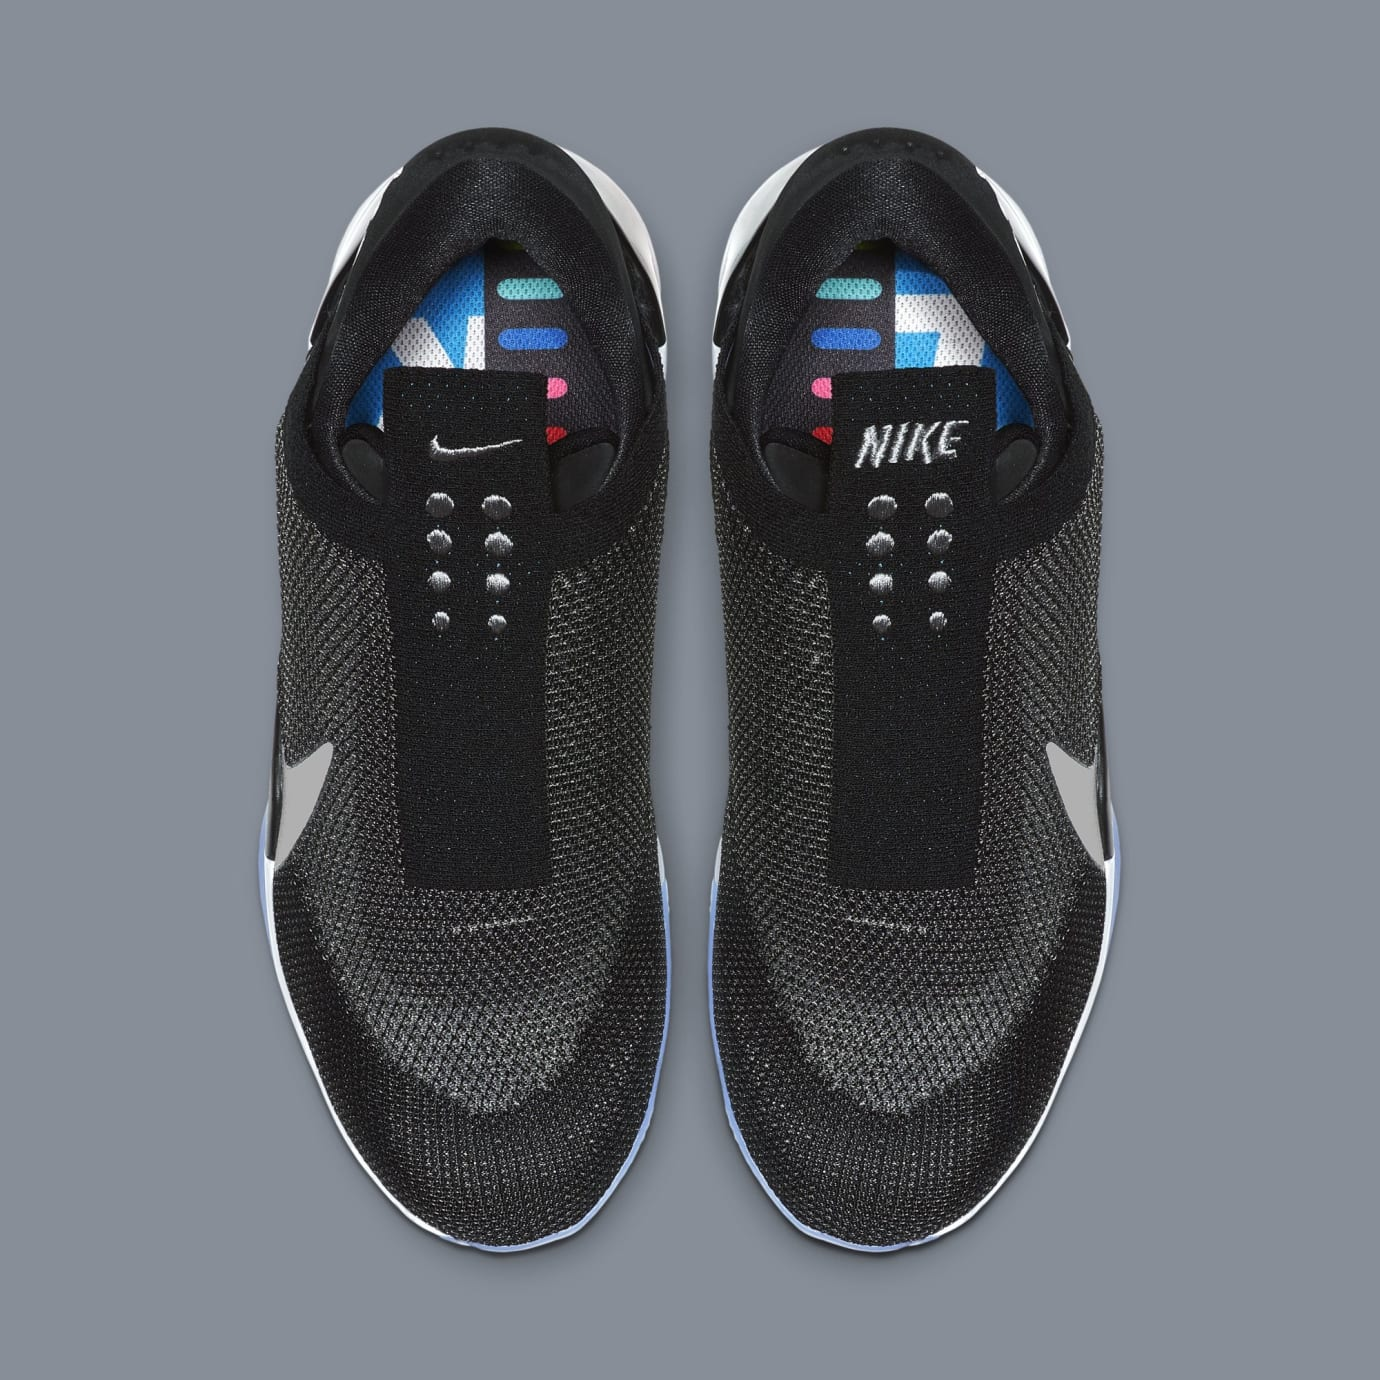 Nike Adapt BB 'Black/White/Pure Platinum' AO2582-001 (Top)